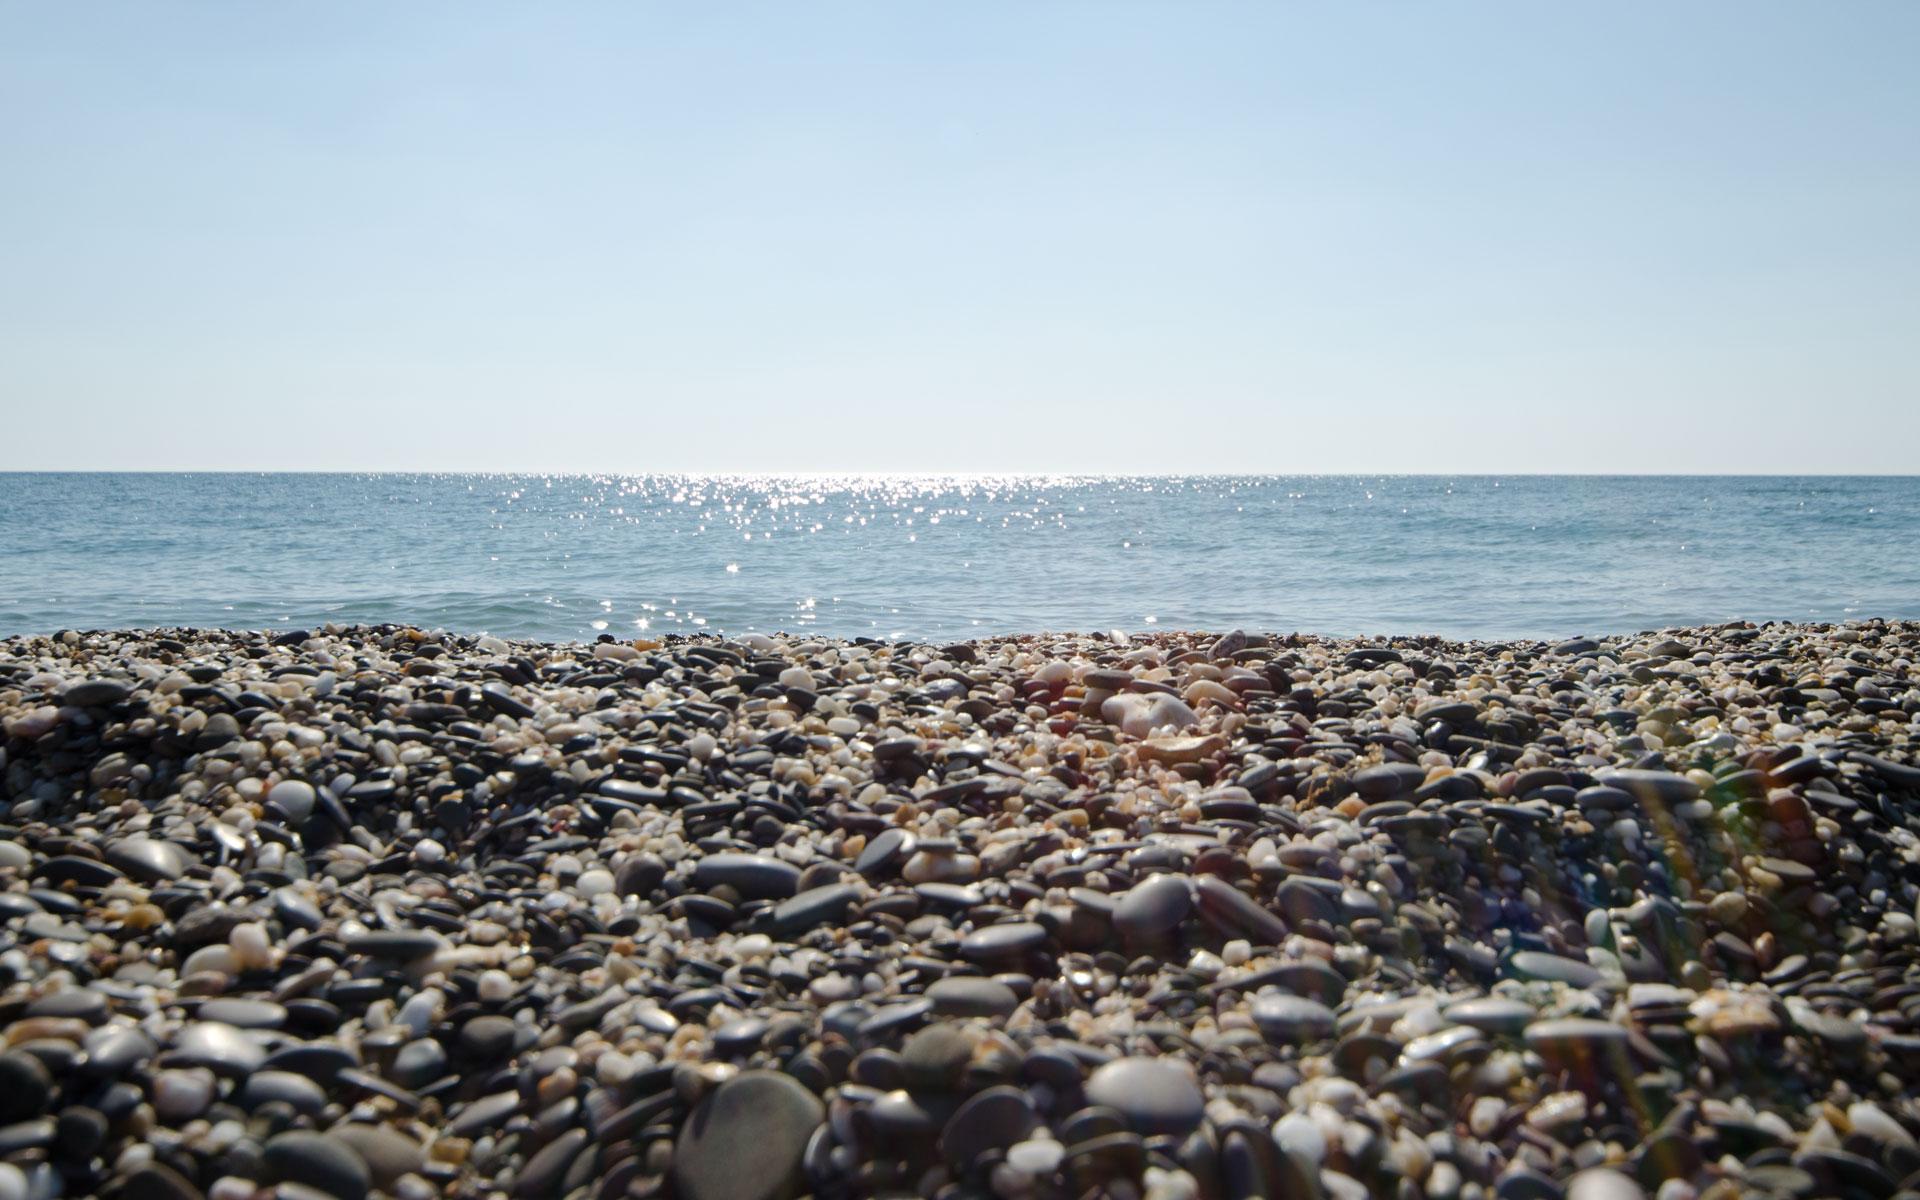 Море, галька 2019. Фото Прибрежного